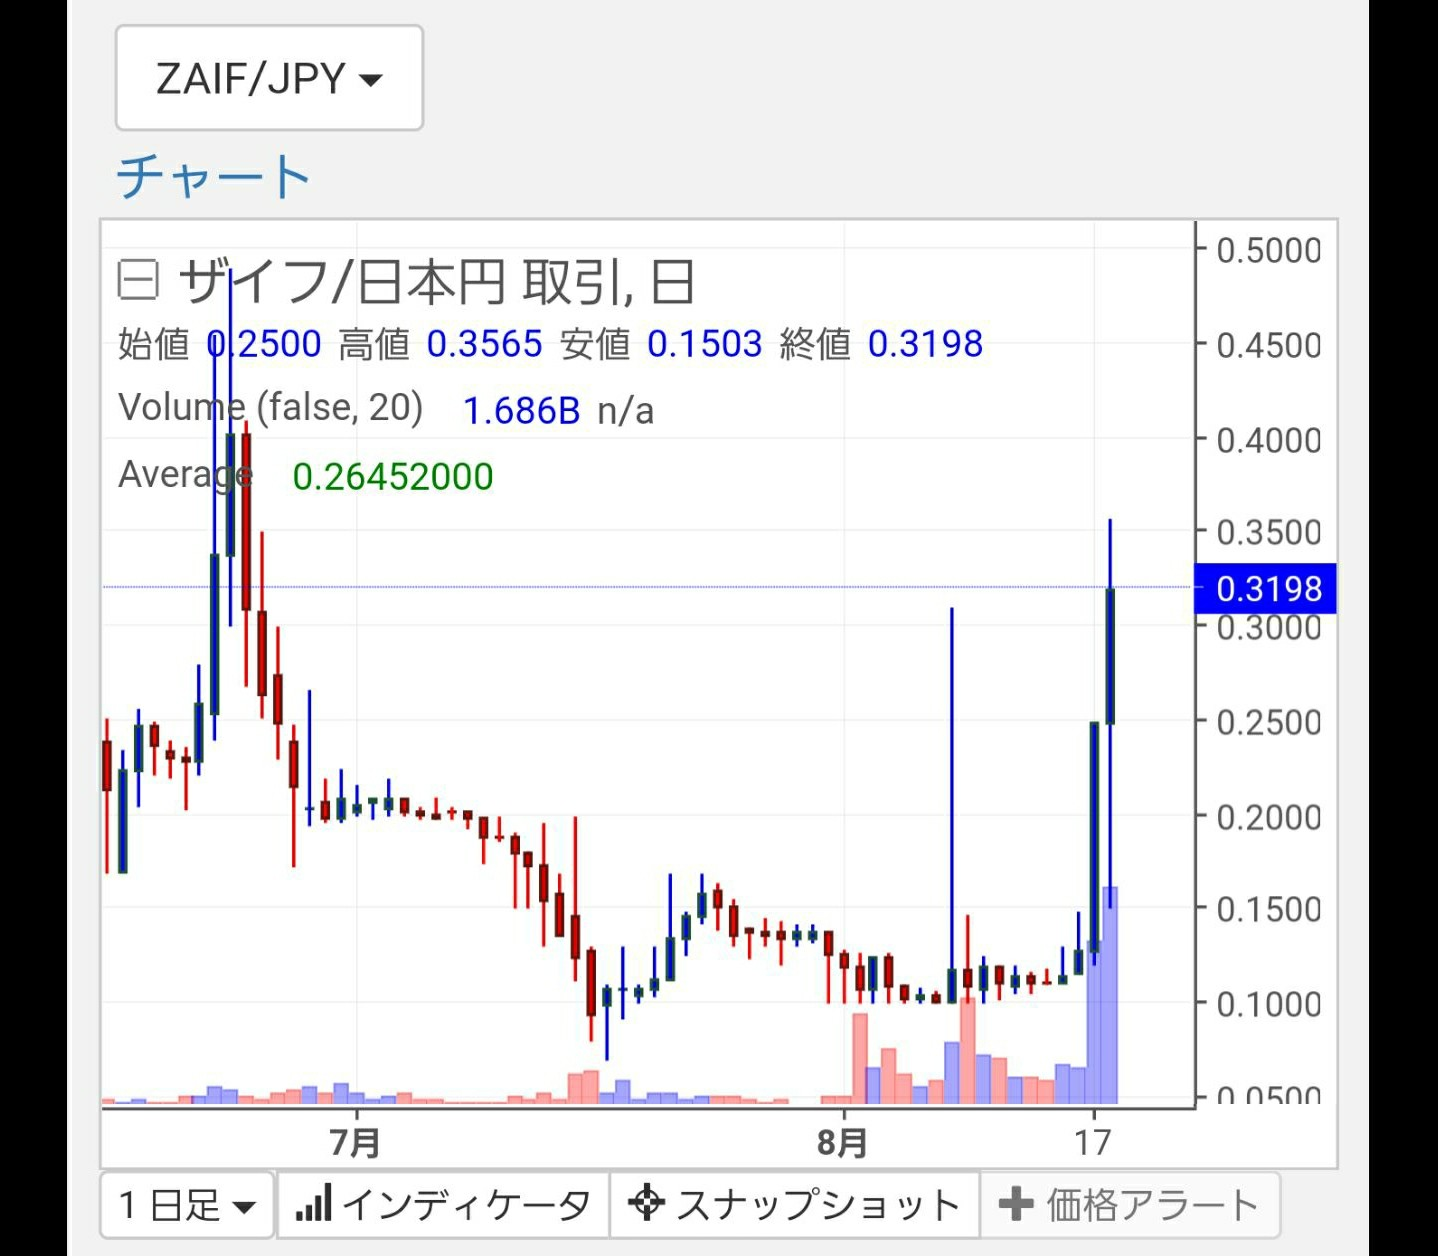 f:id:Cryptocurrency-man_sasu:20170818234833j:plain